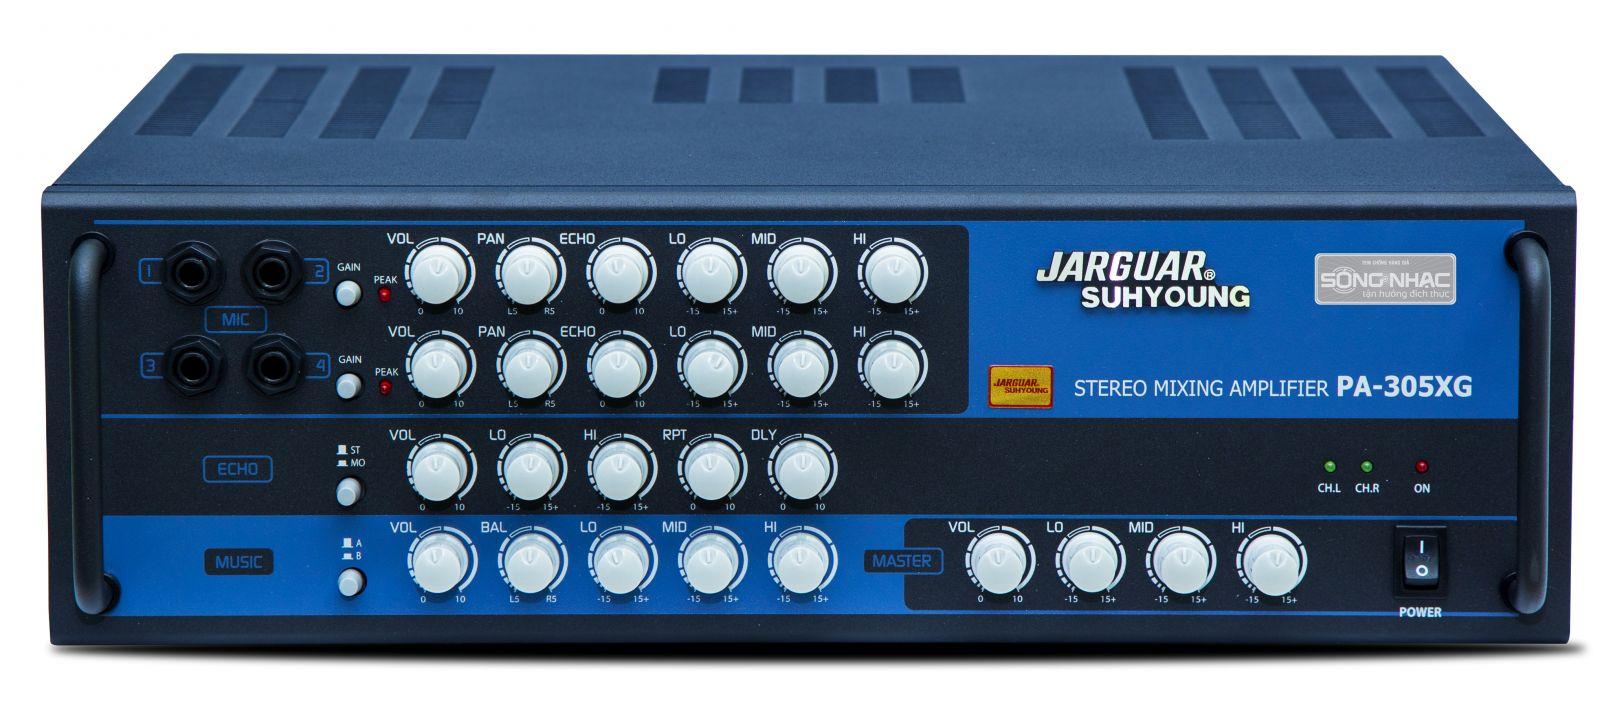 amply-karaoke-jarguarpa-305xg